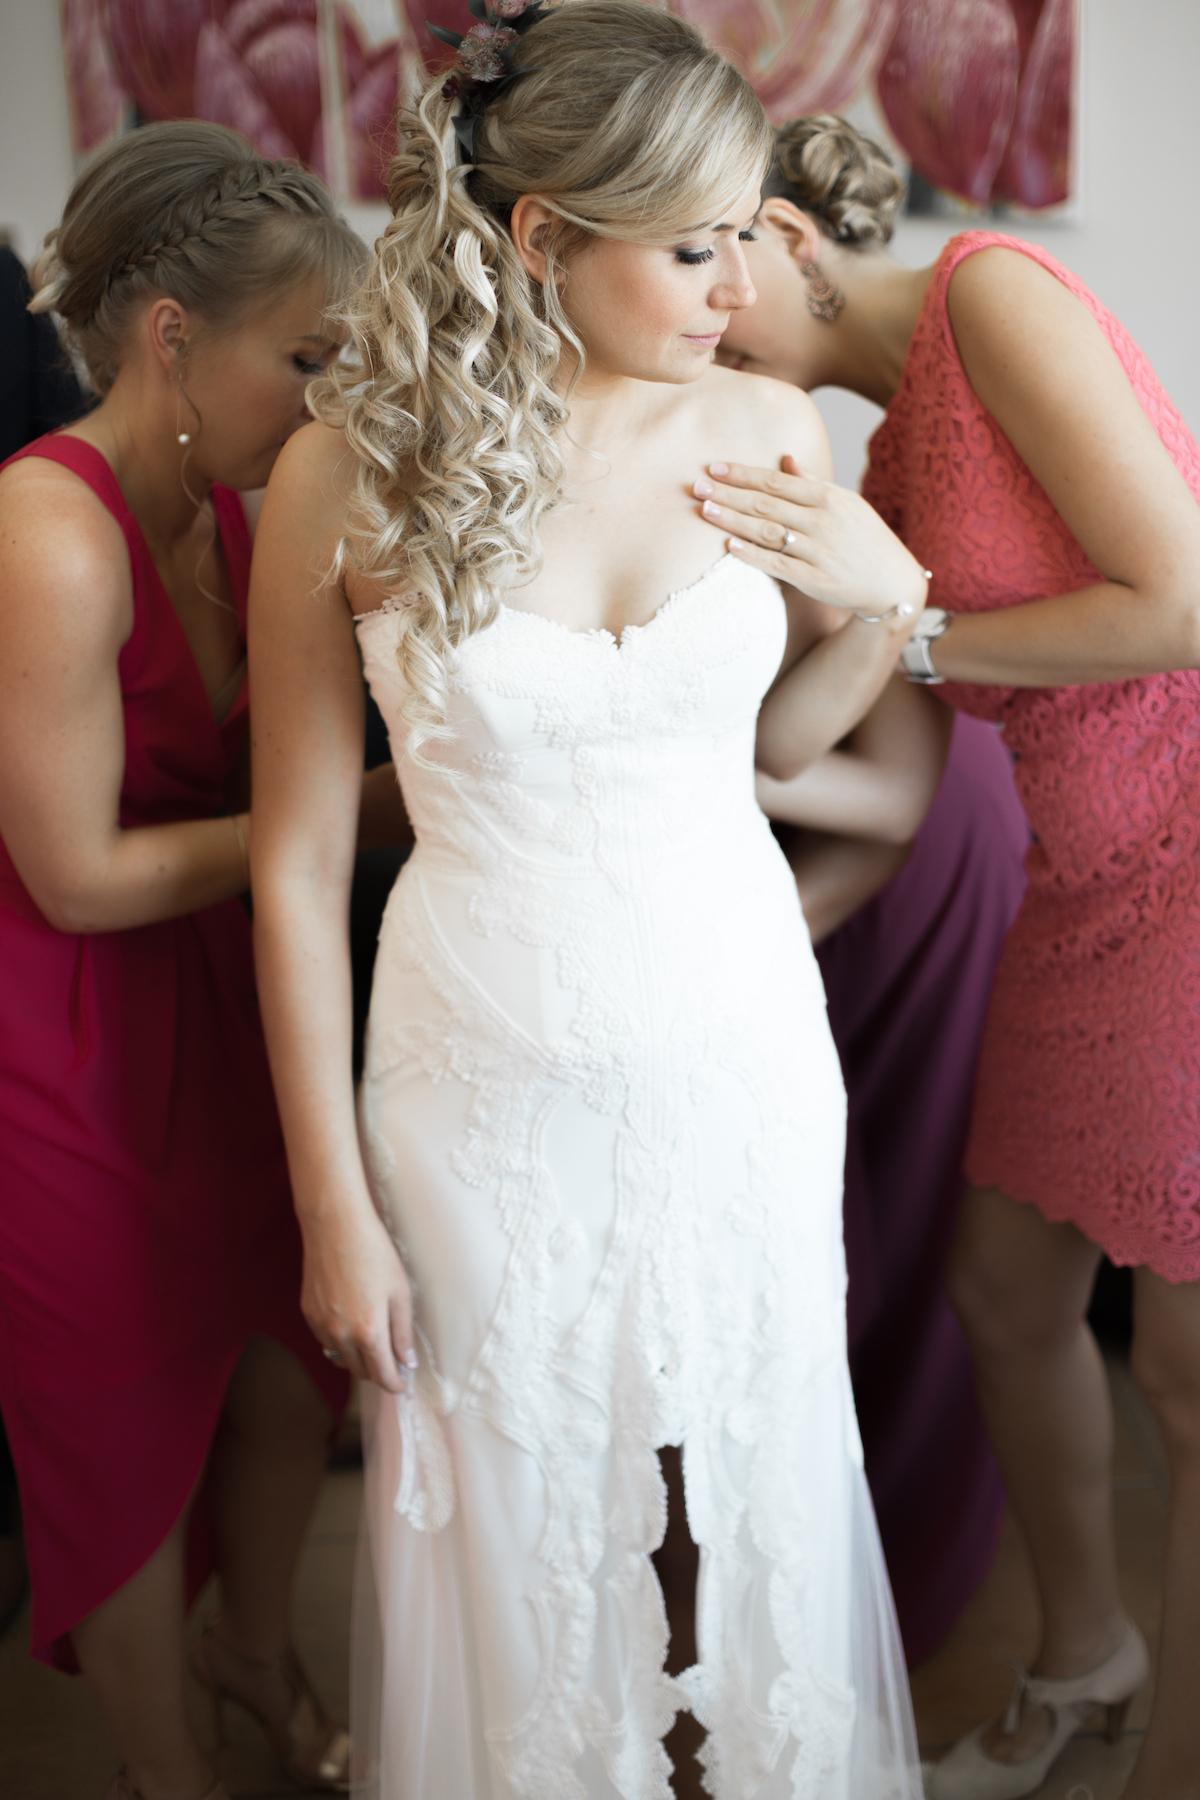 annecy-wedding-photos-76.jpg